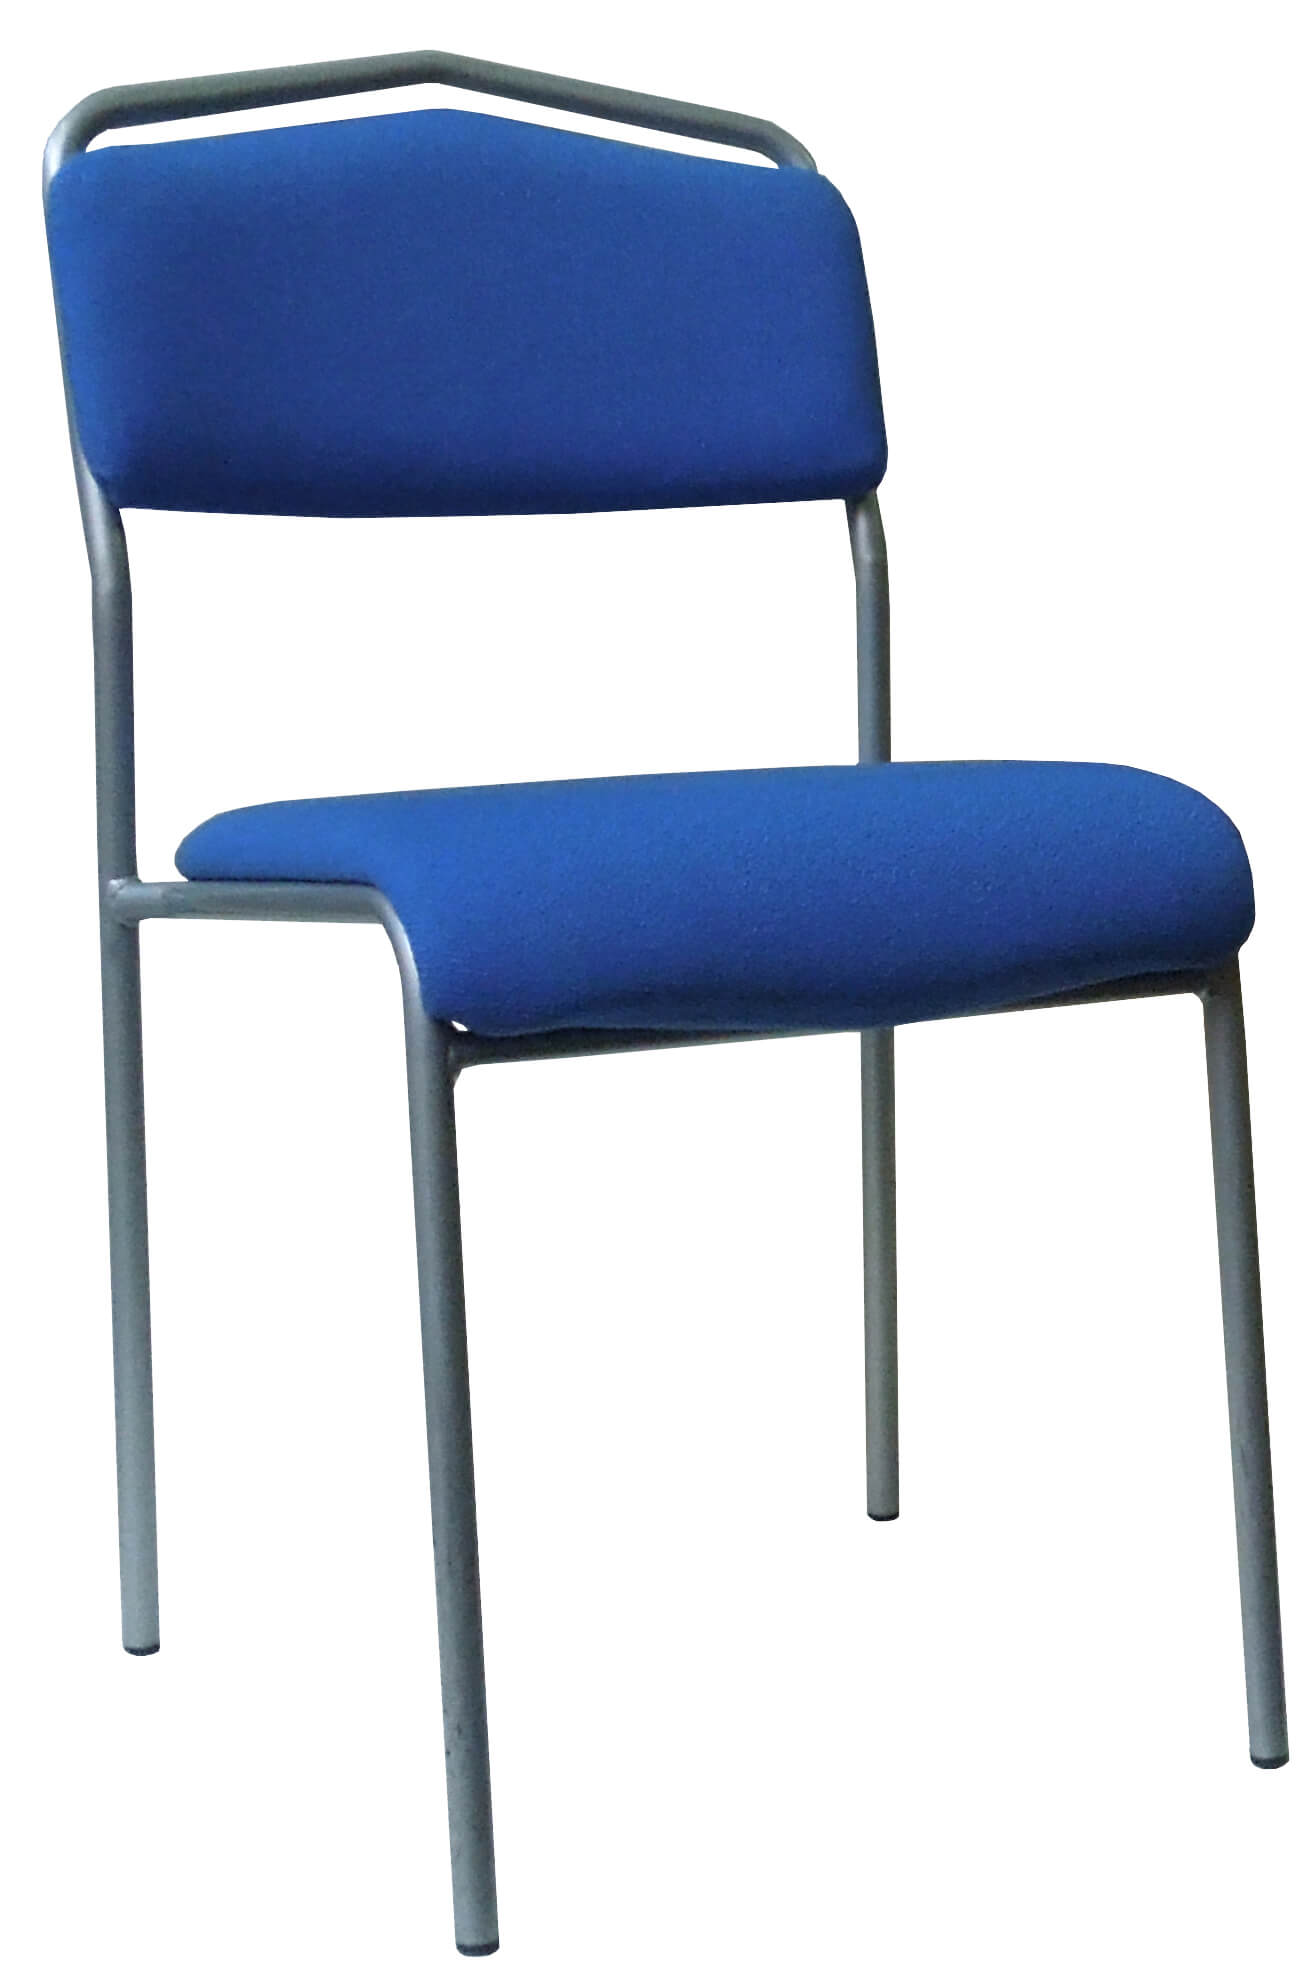 Konferenzstuhl ikea  IKEA Särna Konferenzstuhl silber blau-220145804